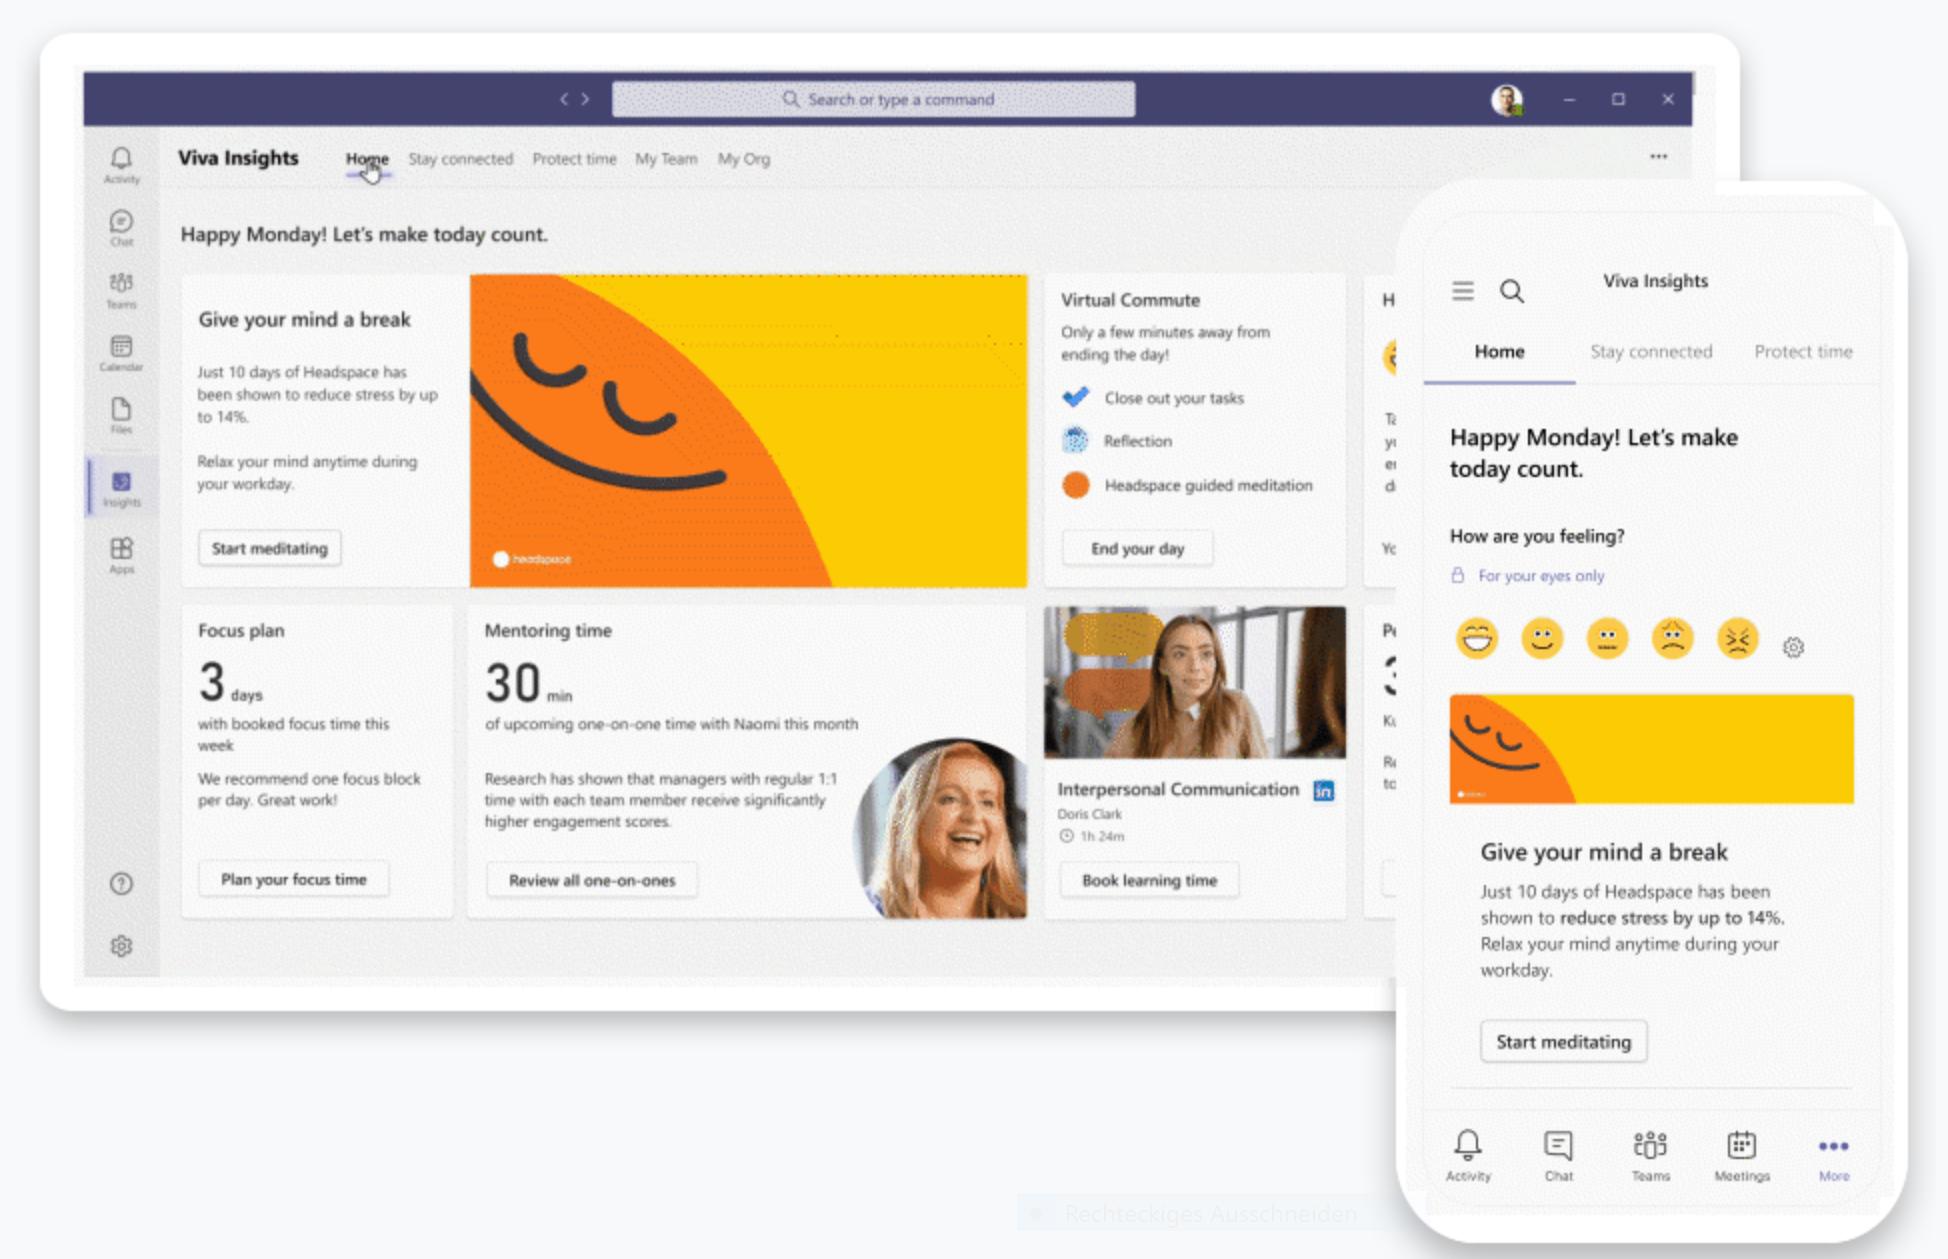 Screenshot Viva Insights